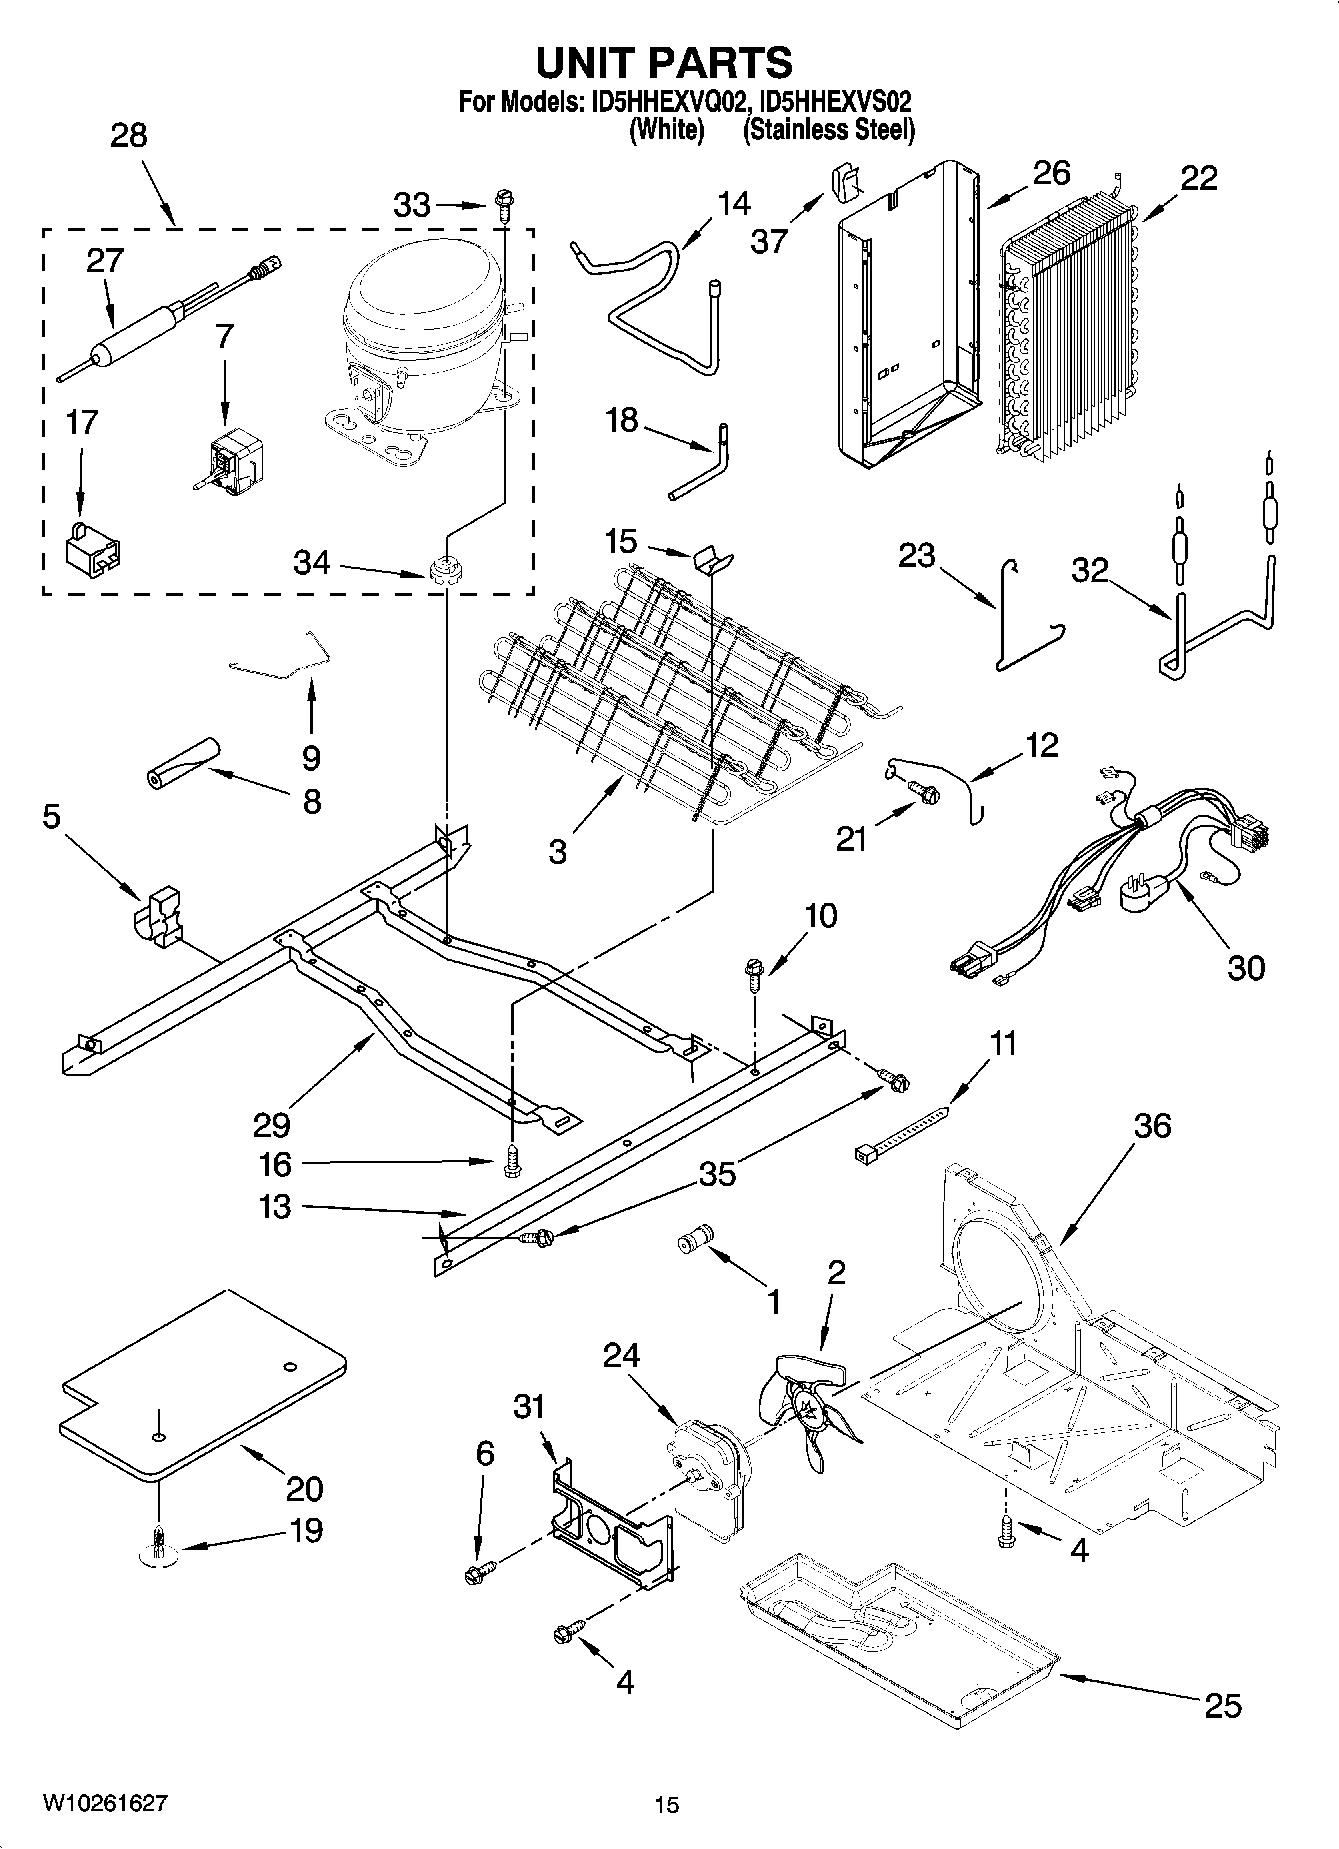 ID5HHEXVS02